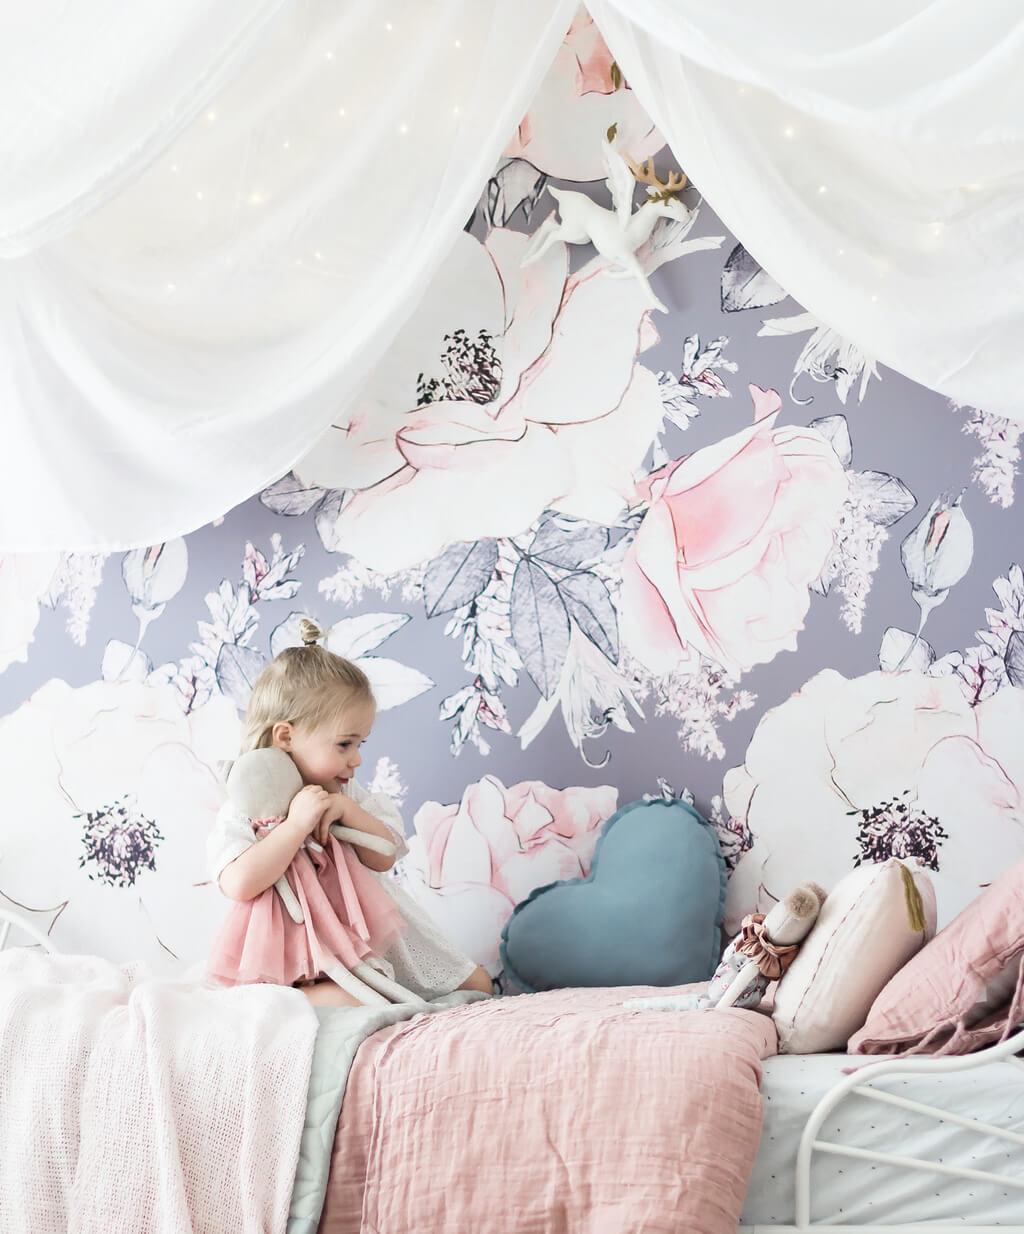 Whimsical children's rooms